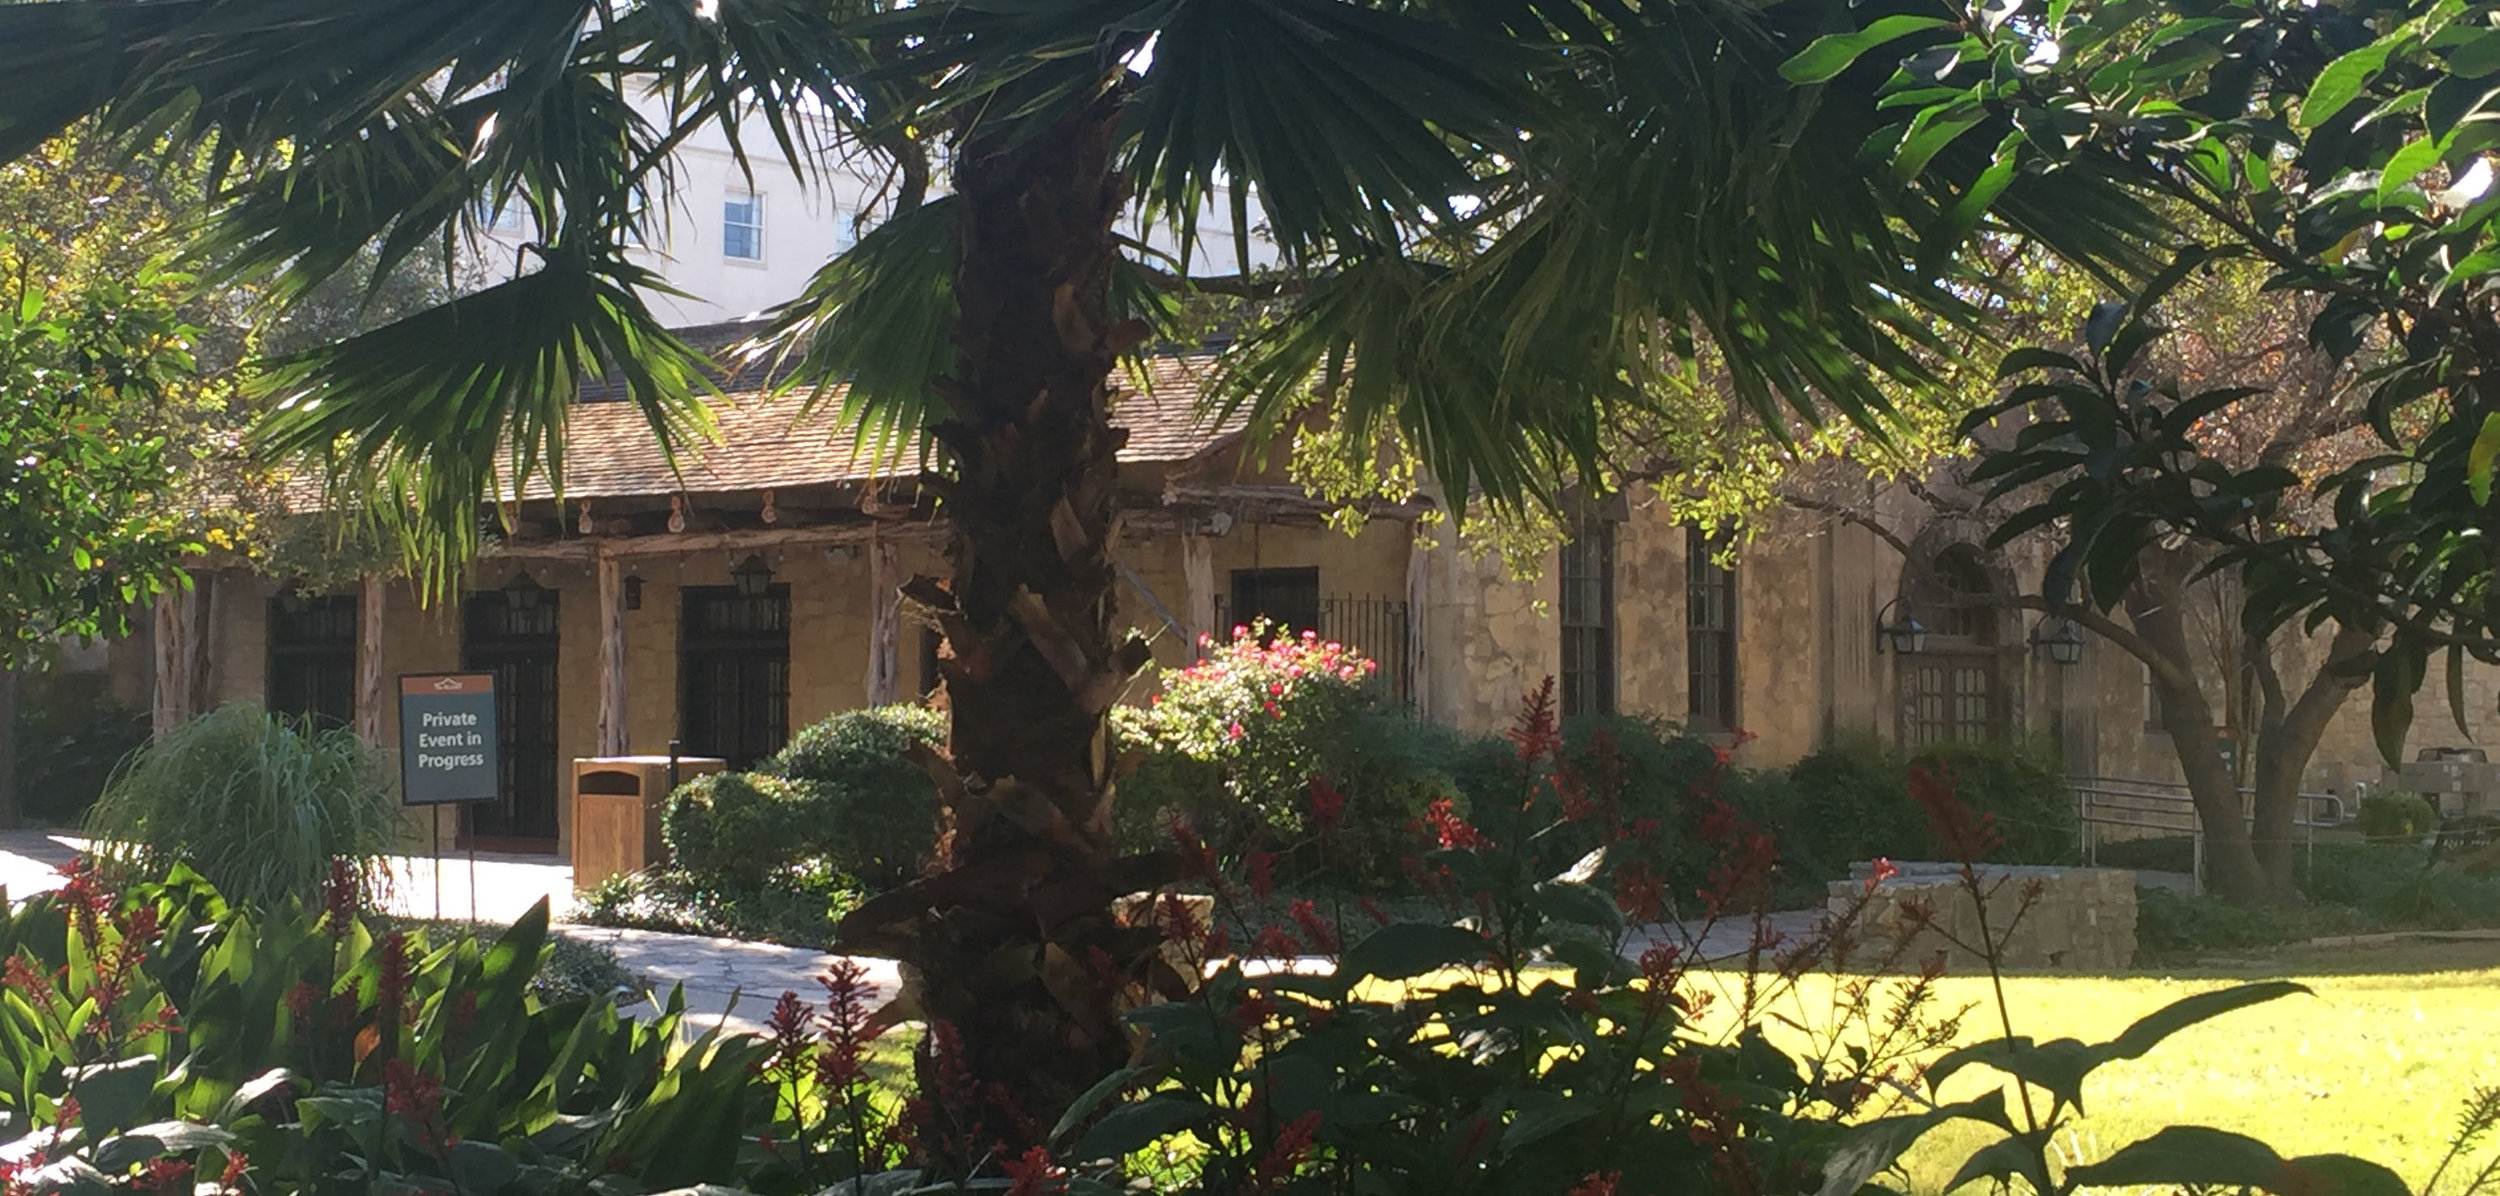 Alamo House.JPG